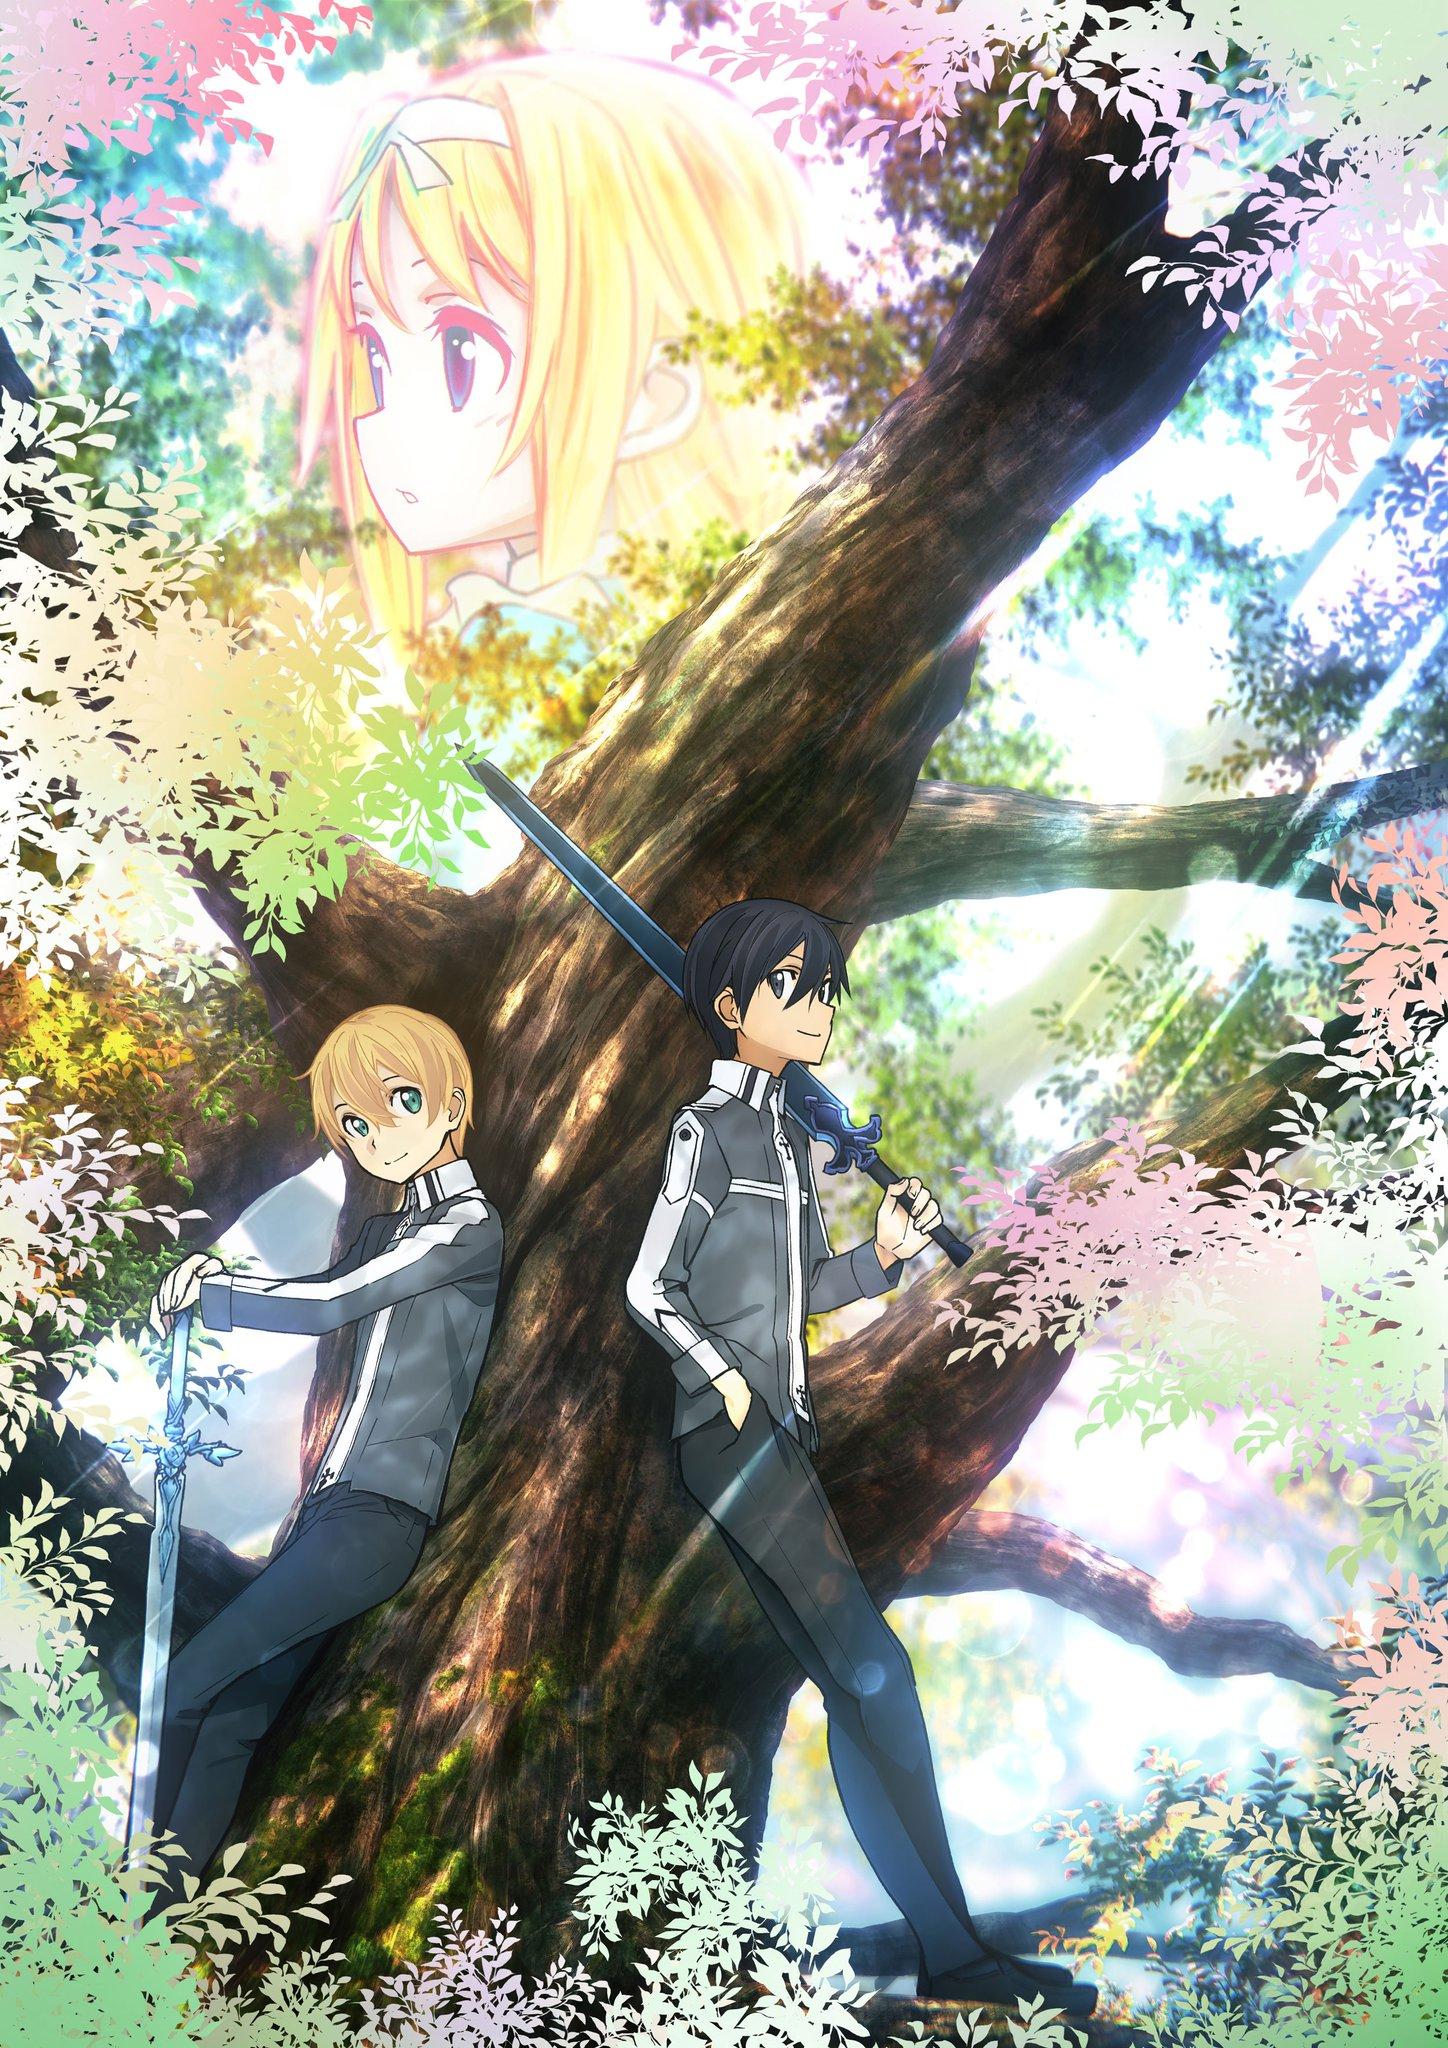 rGNQPxve28jn8 - [Aporte] Sword Art Online: Alicization [24/24][85MB][MEGA][Concluido] - Anime Ligero [Descargas]